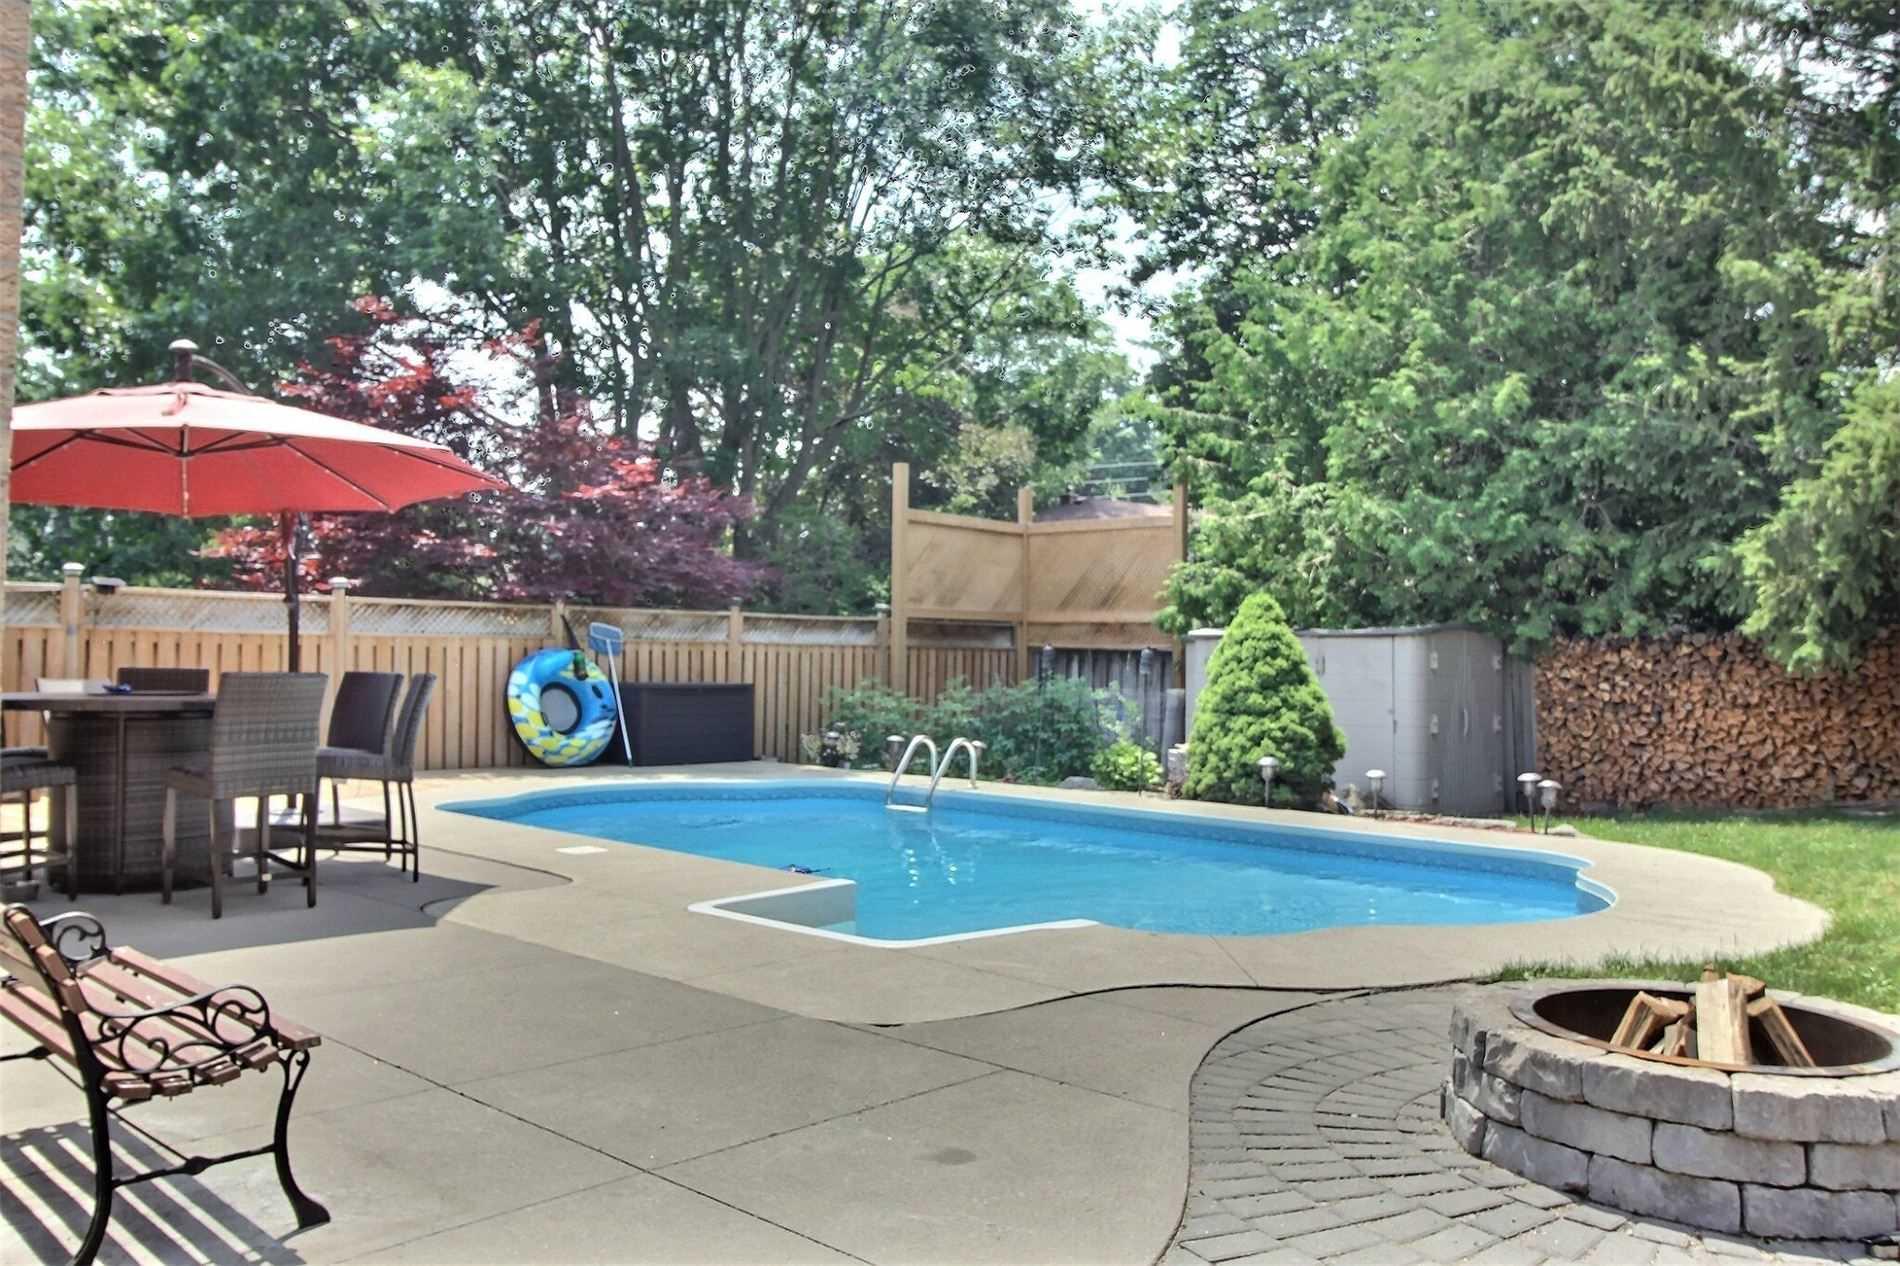 Detached house For Sale In Clarington - 49 Farncomb Cres, Clarington, Ontario, Canada L1C4L8 , 4 Bedrooms Bedrooms, ,4 BathroomsBathrooms,Detached,For Sale,Farncomb